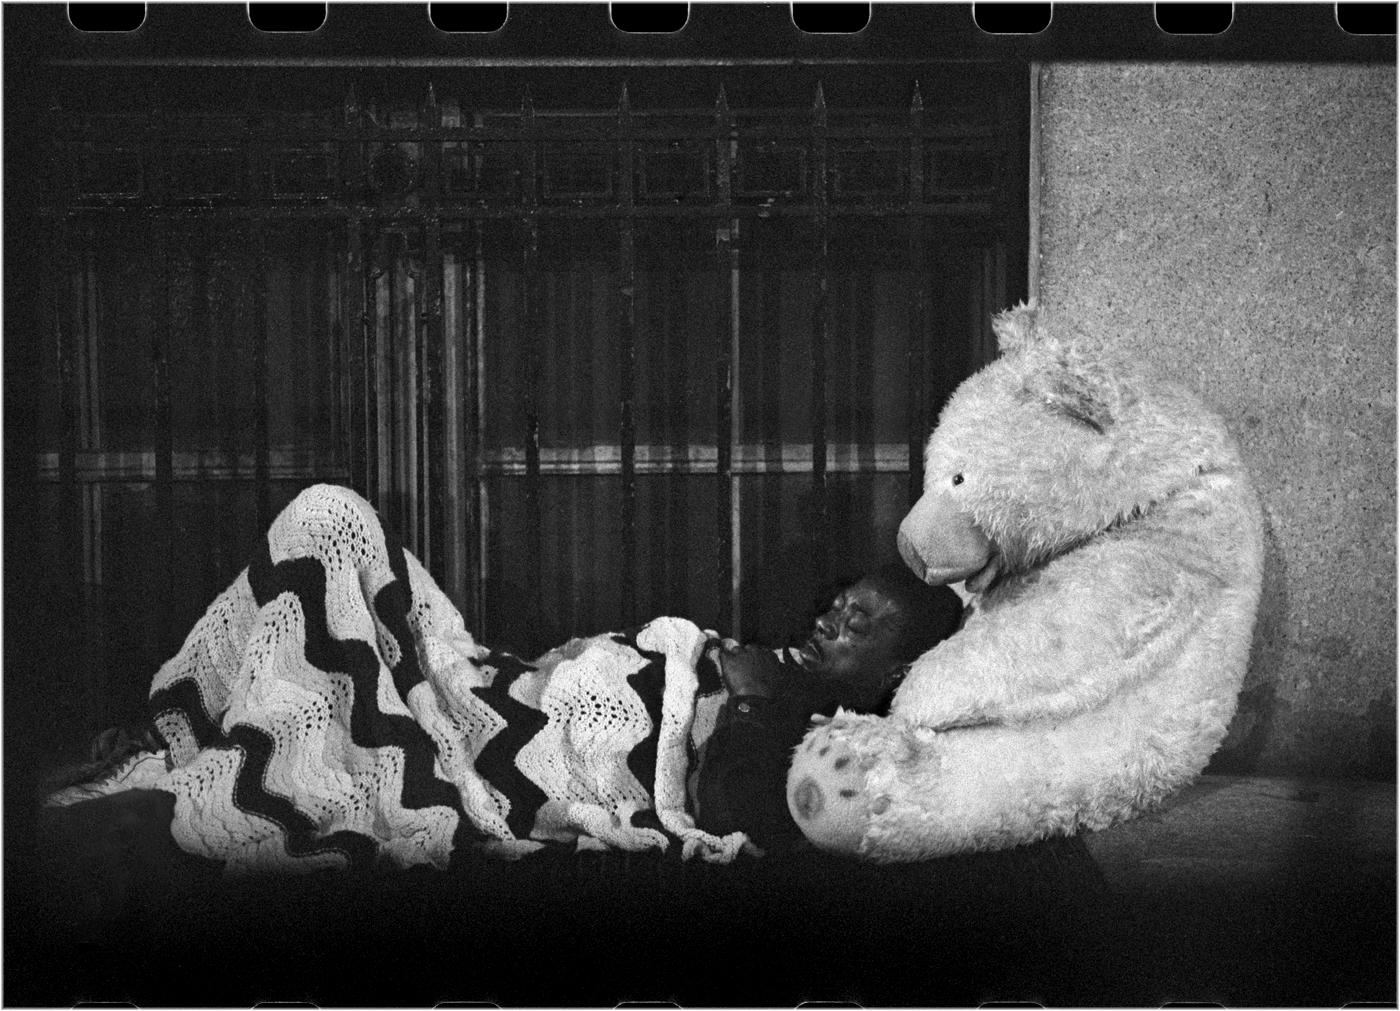 SleepingBear-1990-8000 copy